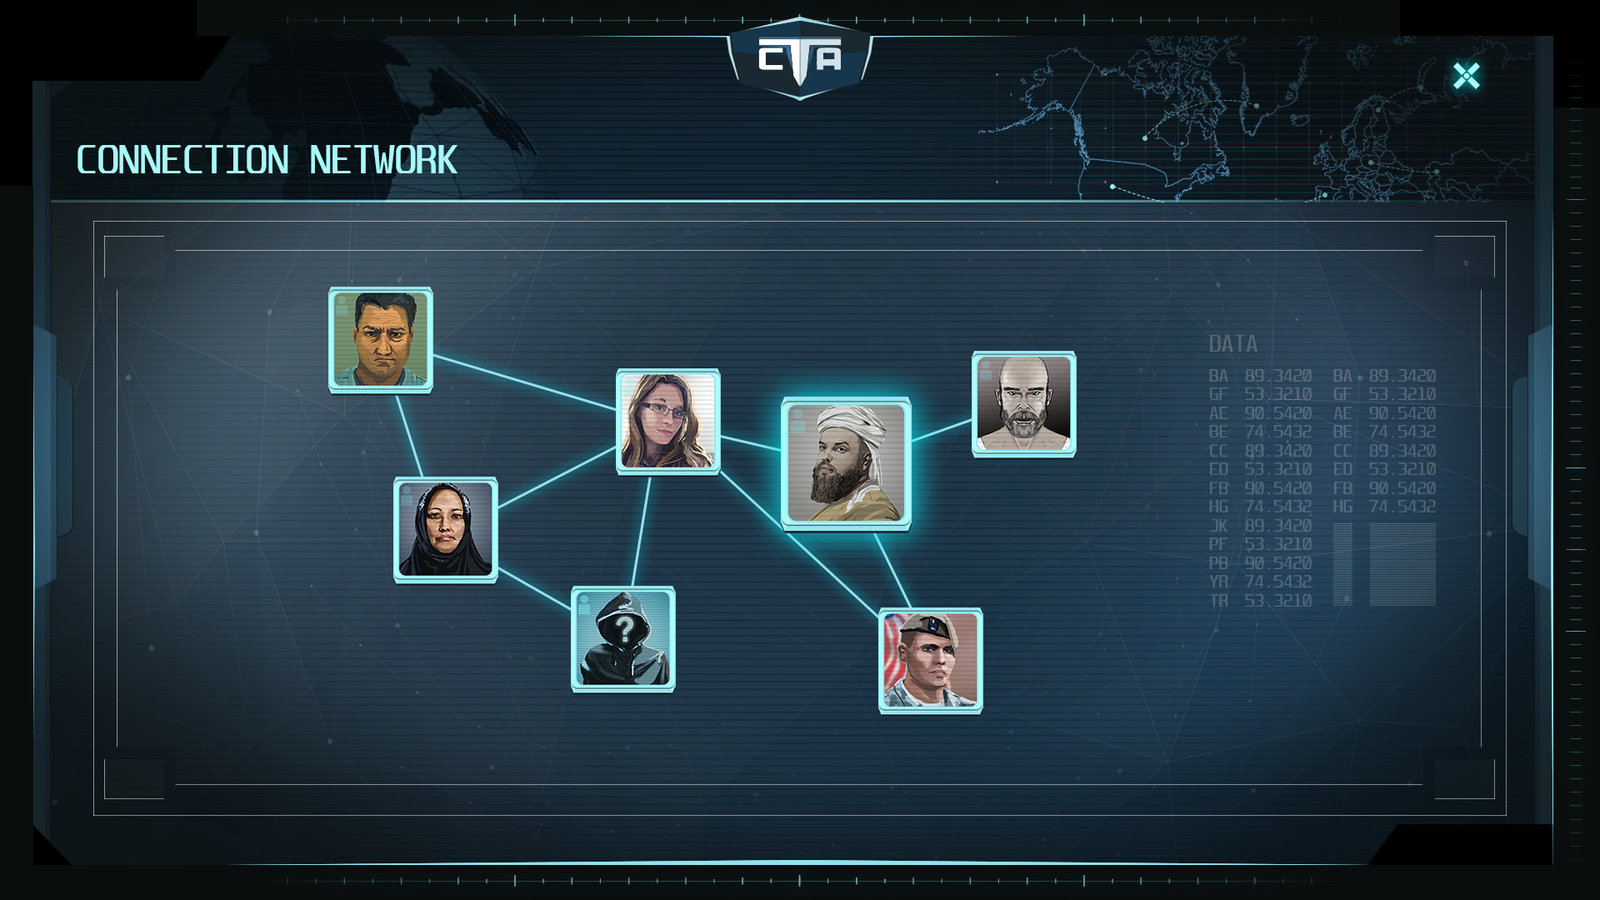 Counter Terrorist Agency image 1